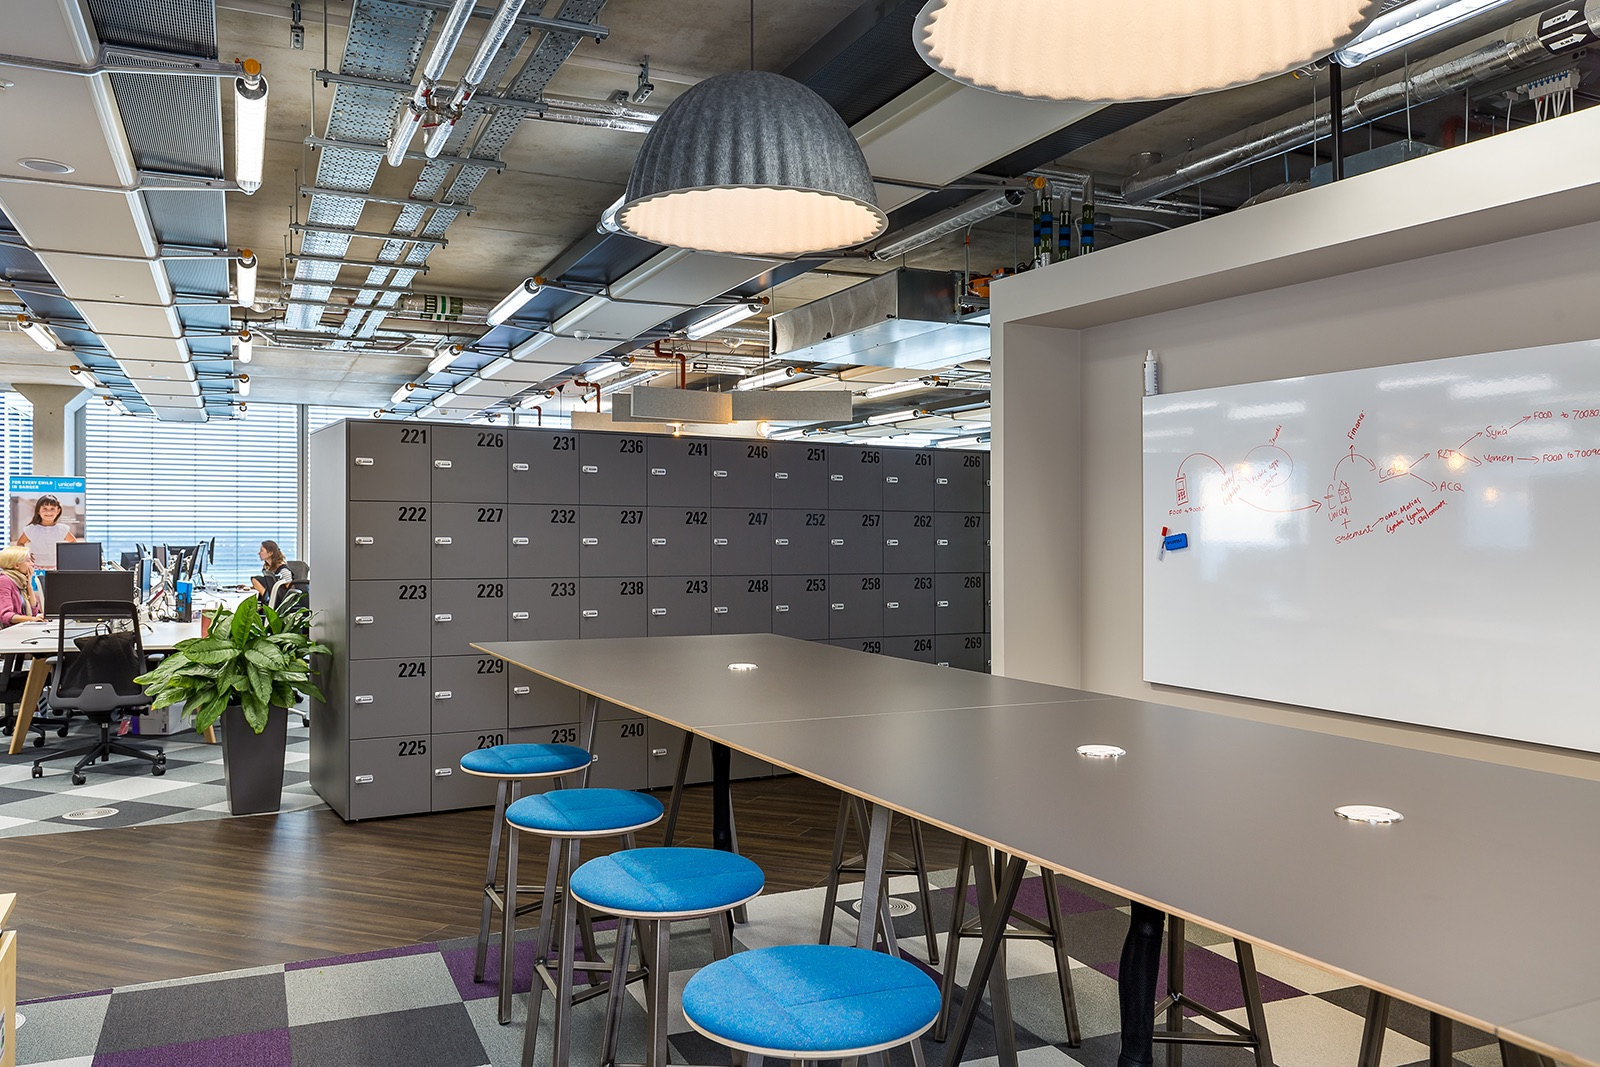 unicef-london-office-10